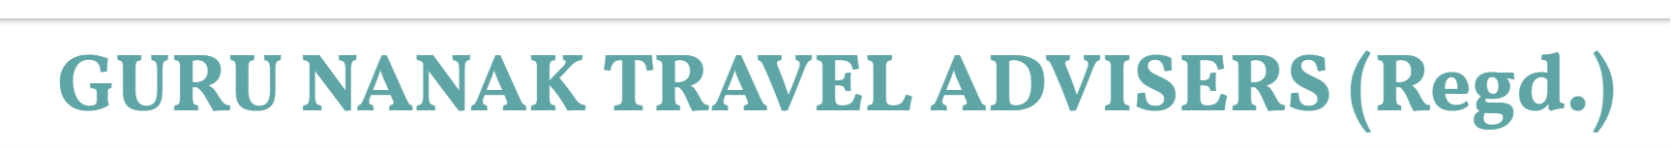 Guru Nanak Travel Advisers - Moga